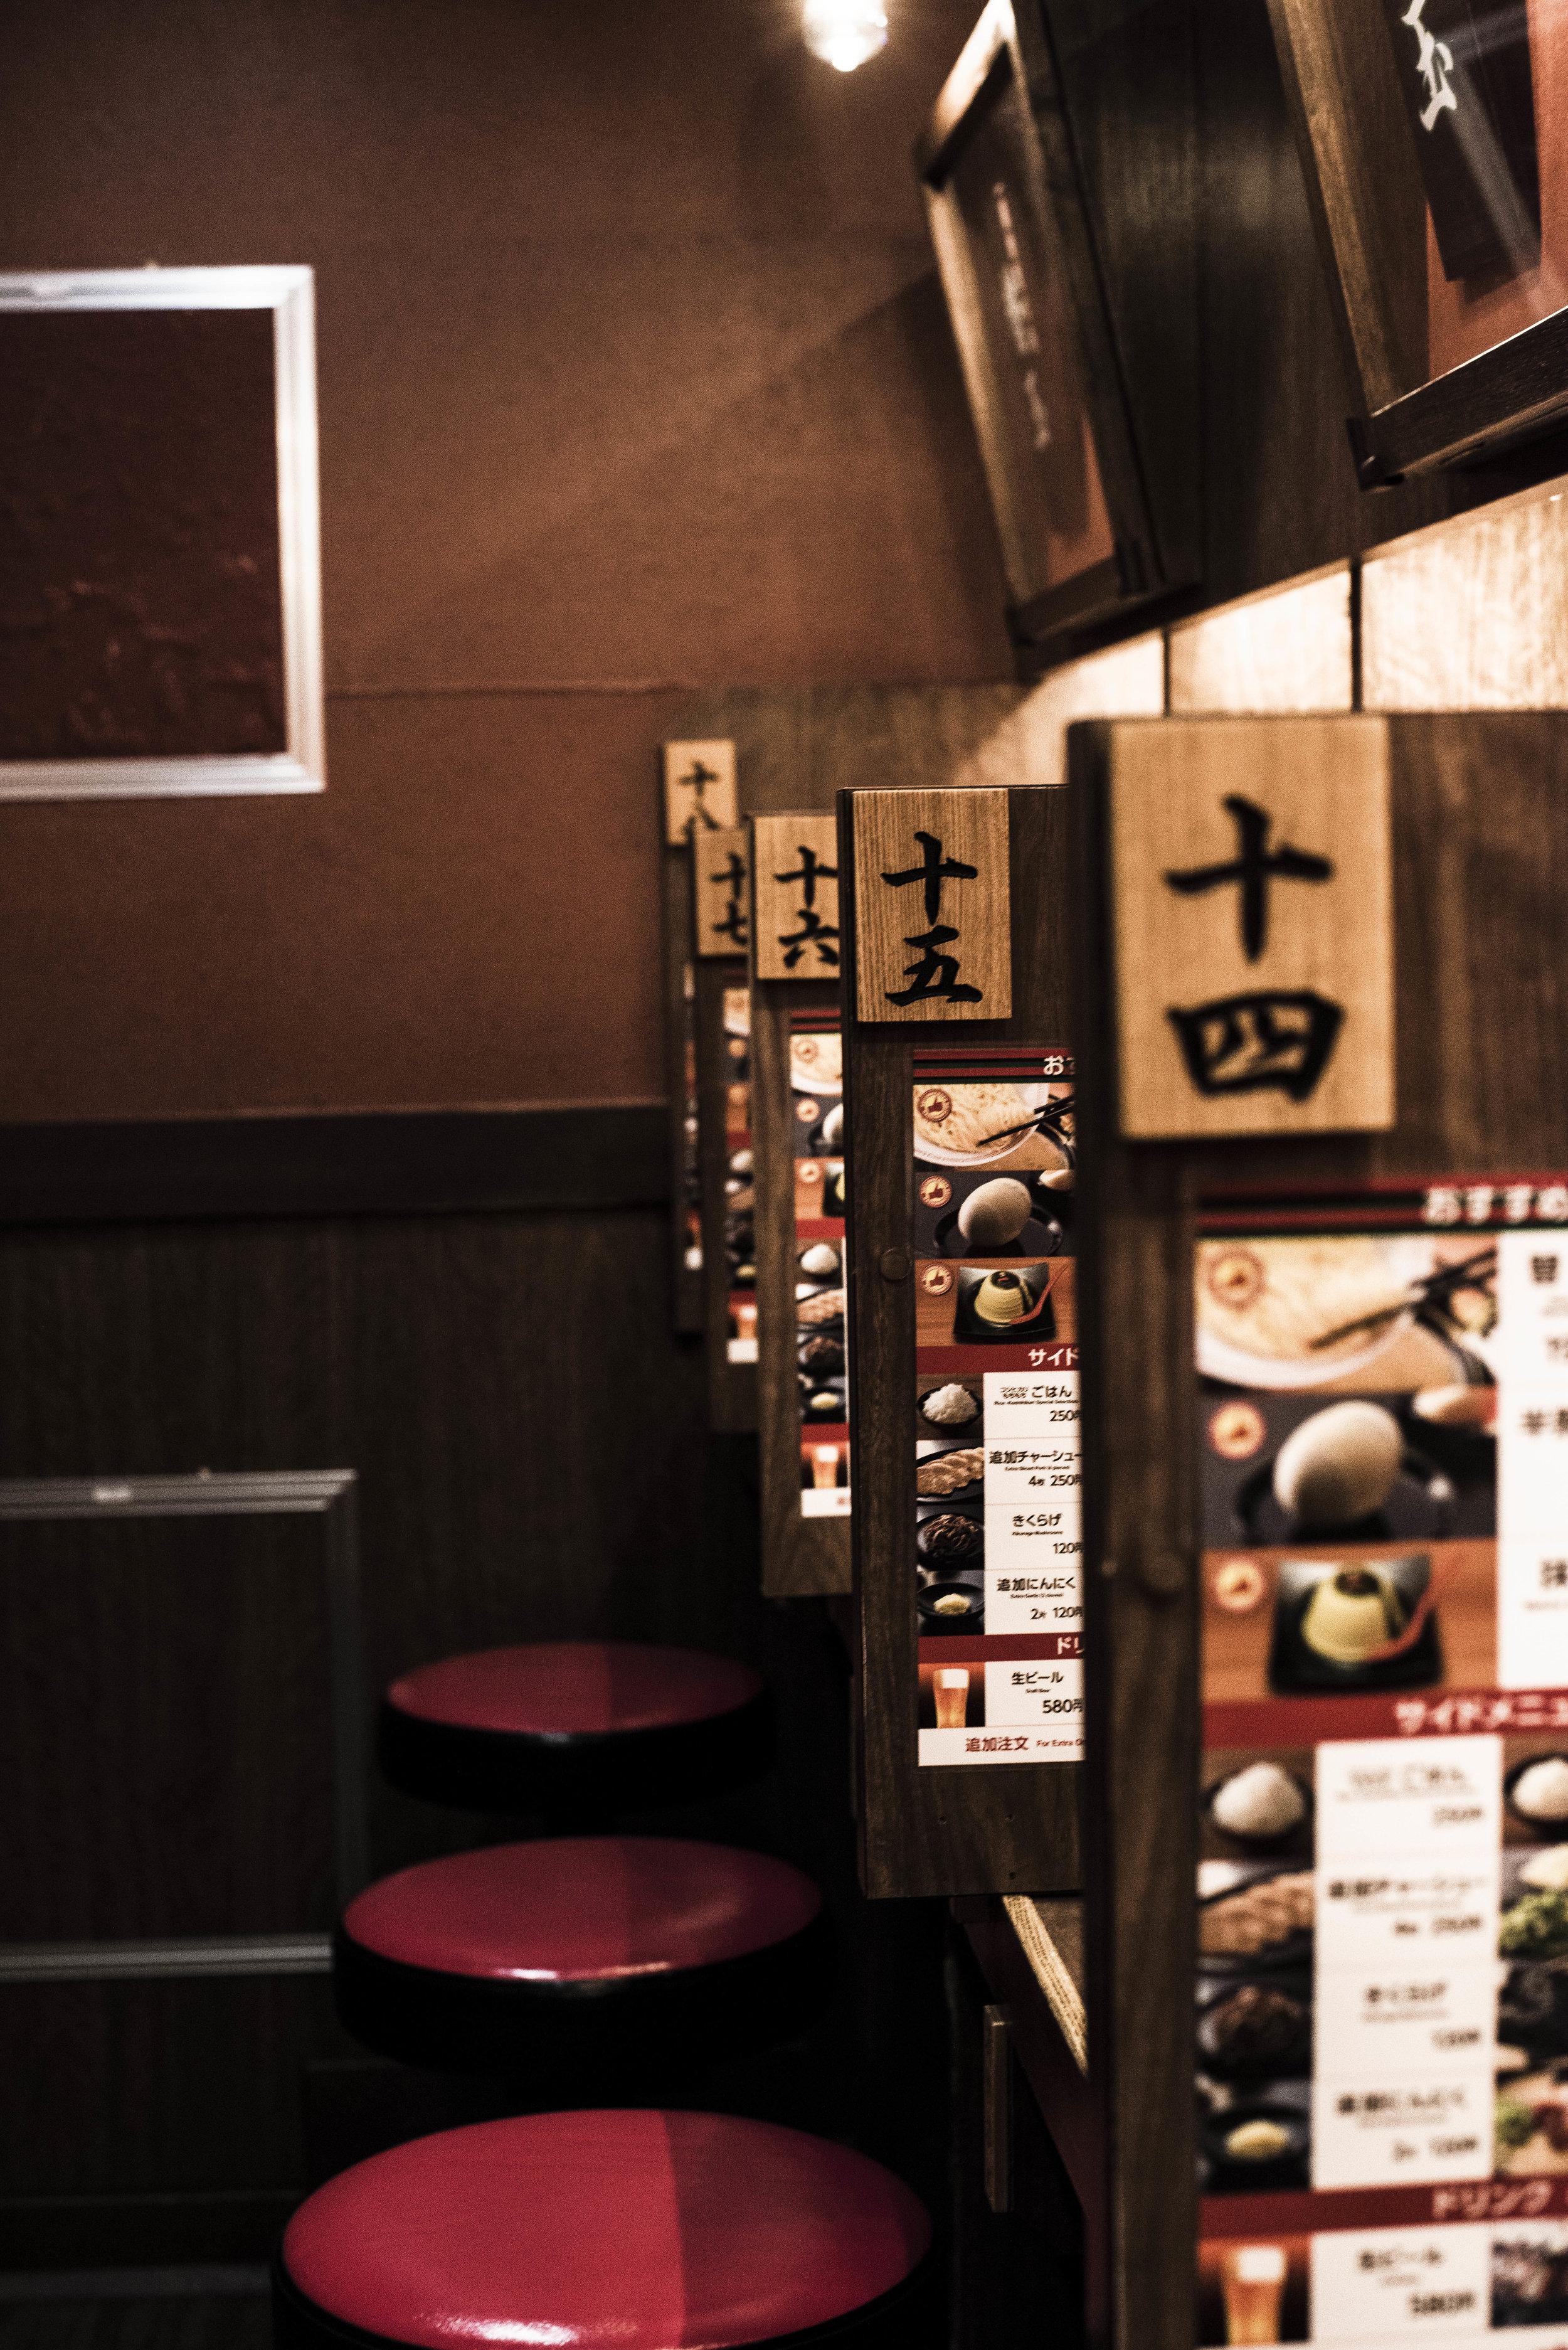 Ichiran Ramen in Shimokitazawa, Tokyo